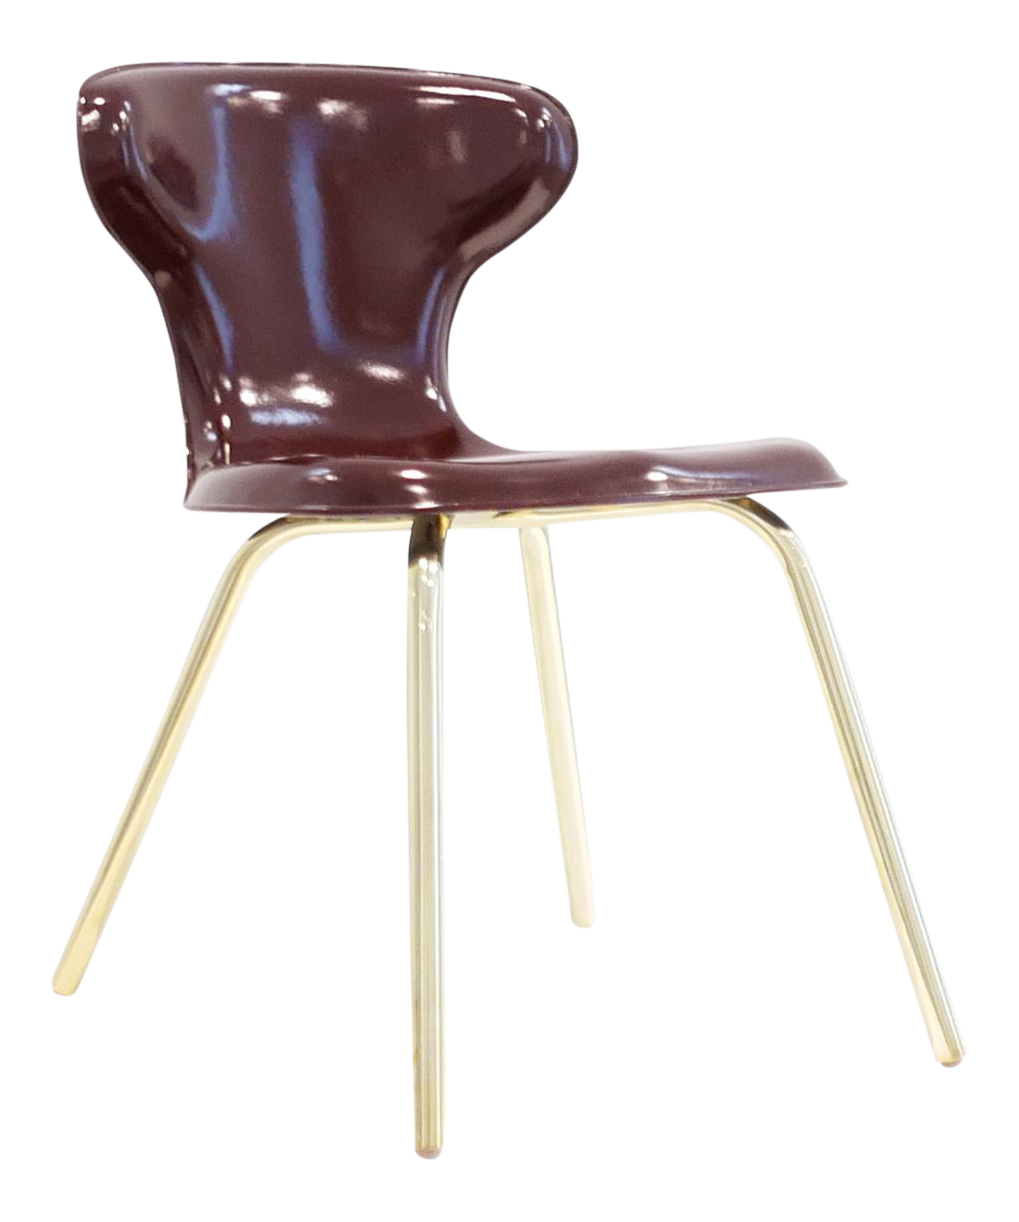 Egmont Arens, Fiberglass Chair, C. 1950   1959